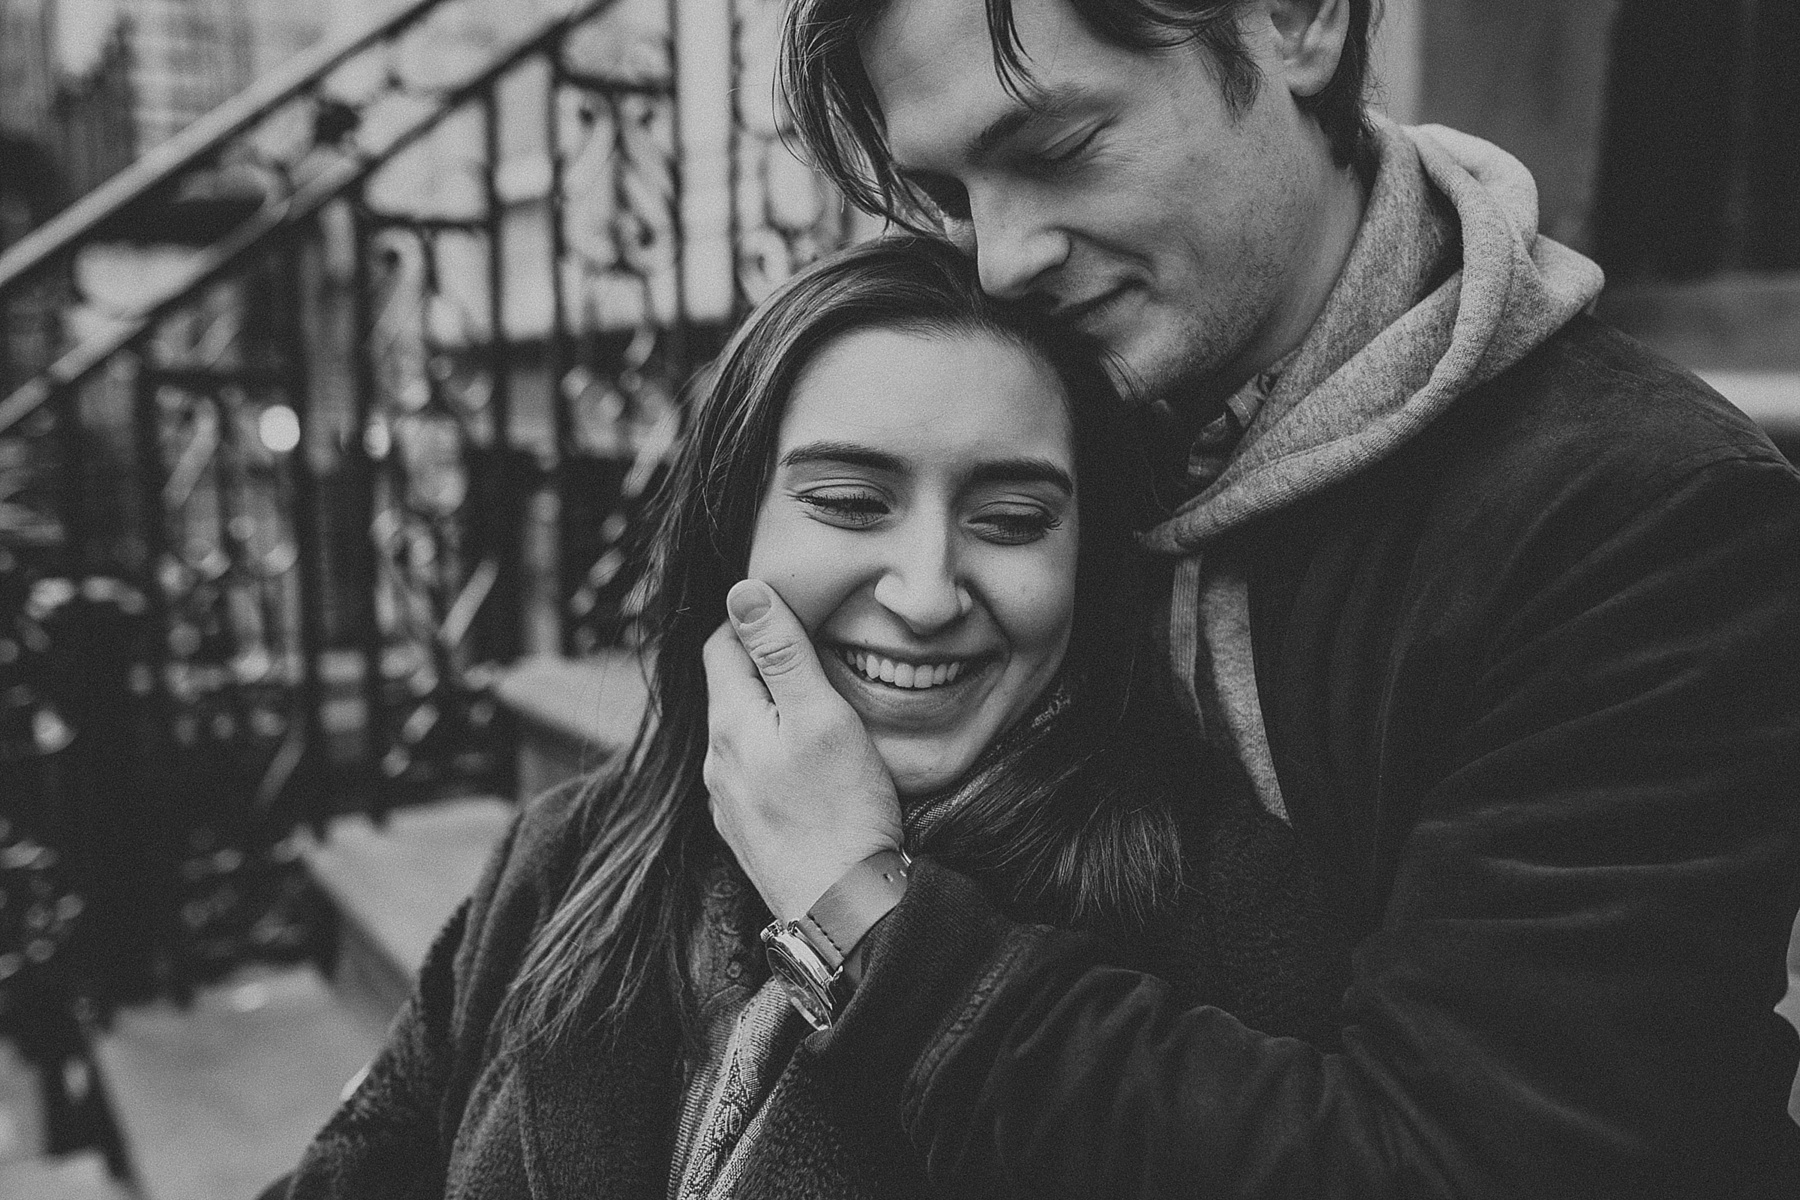 Engagement photos on New York City brownstone steps